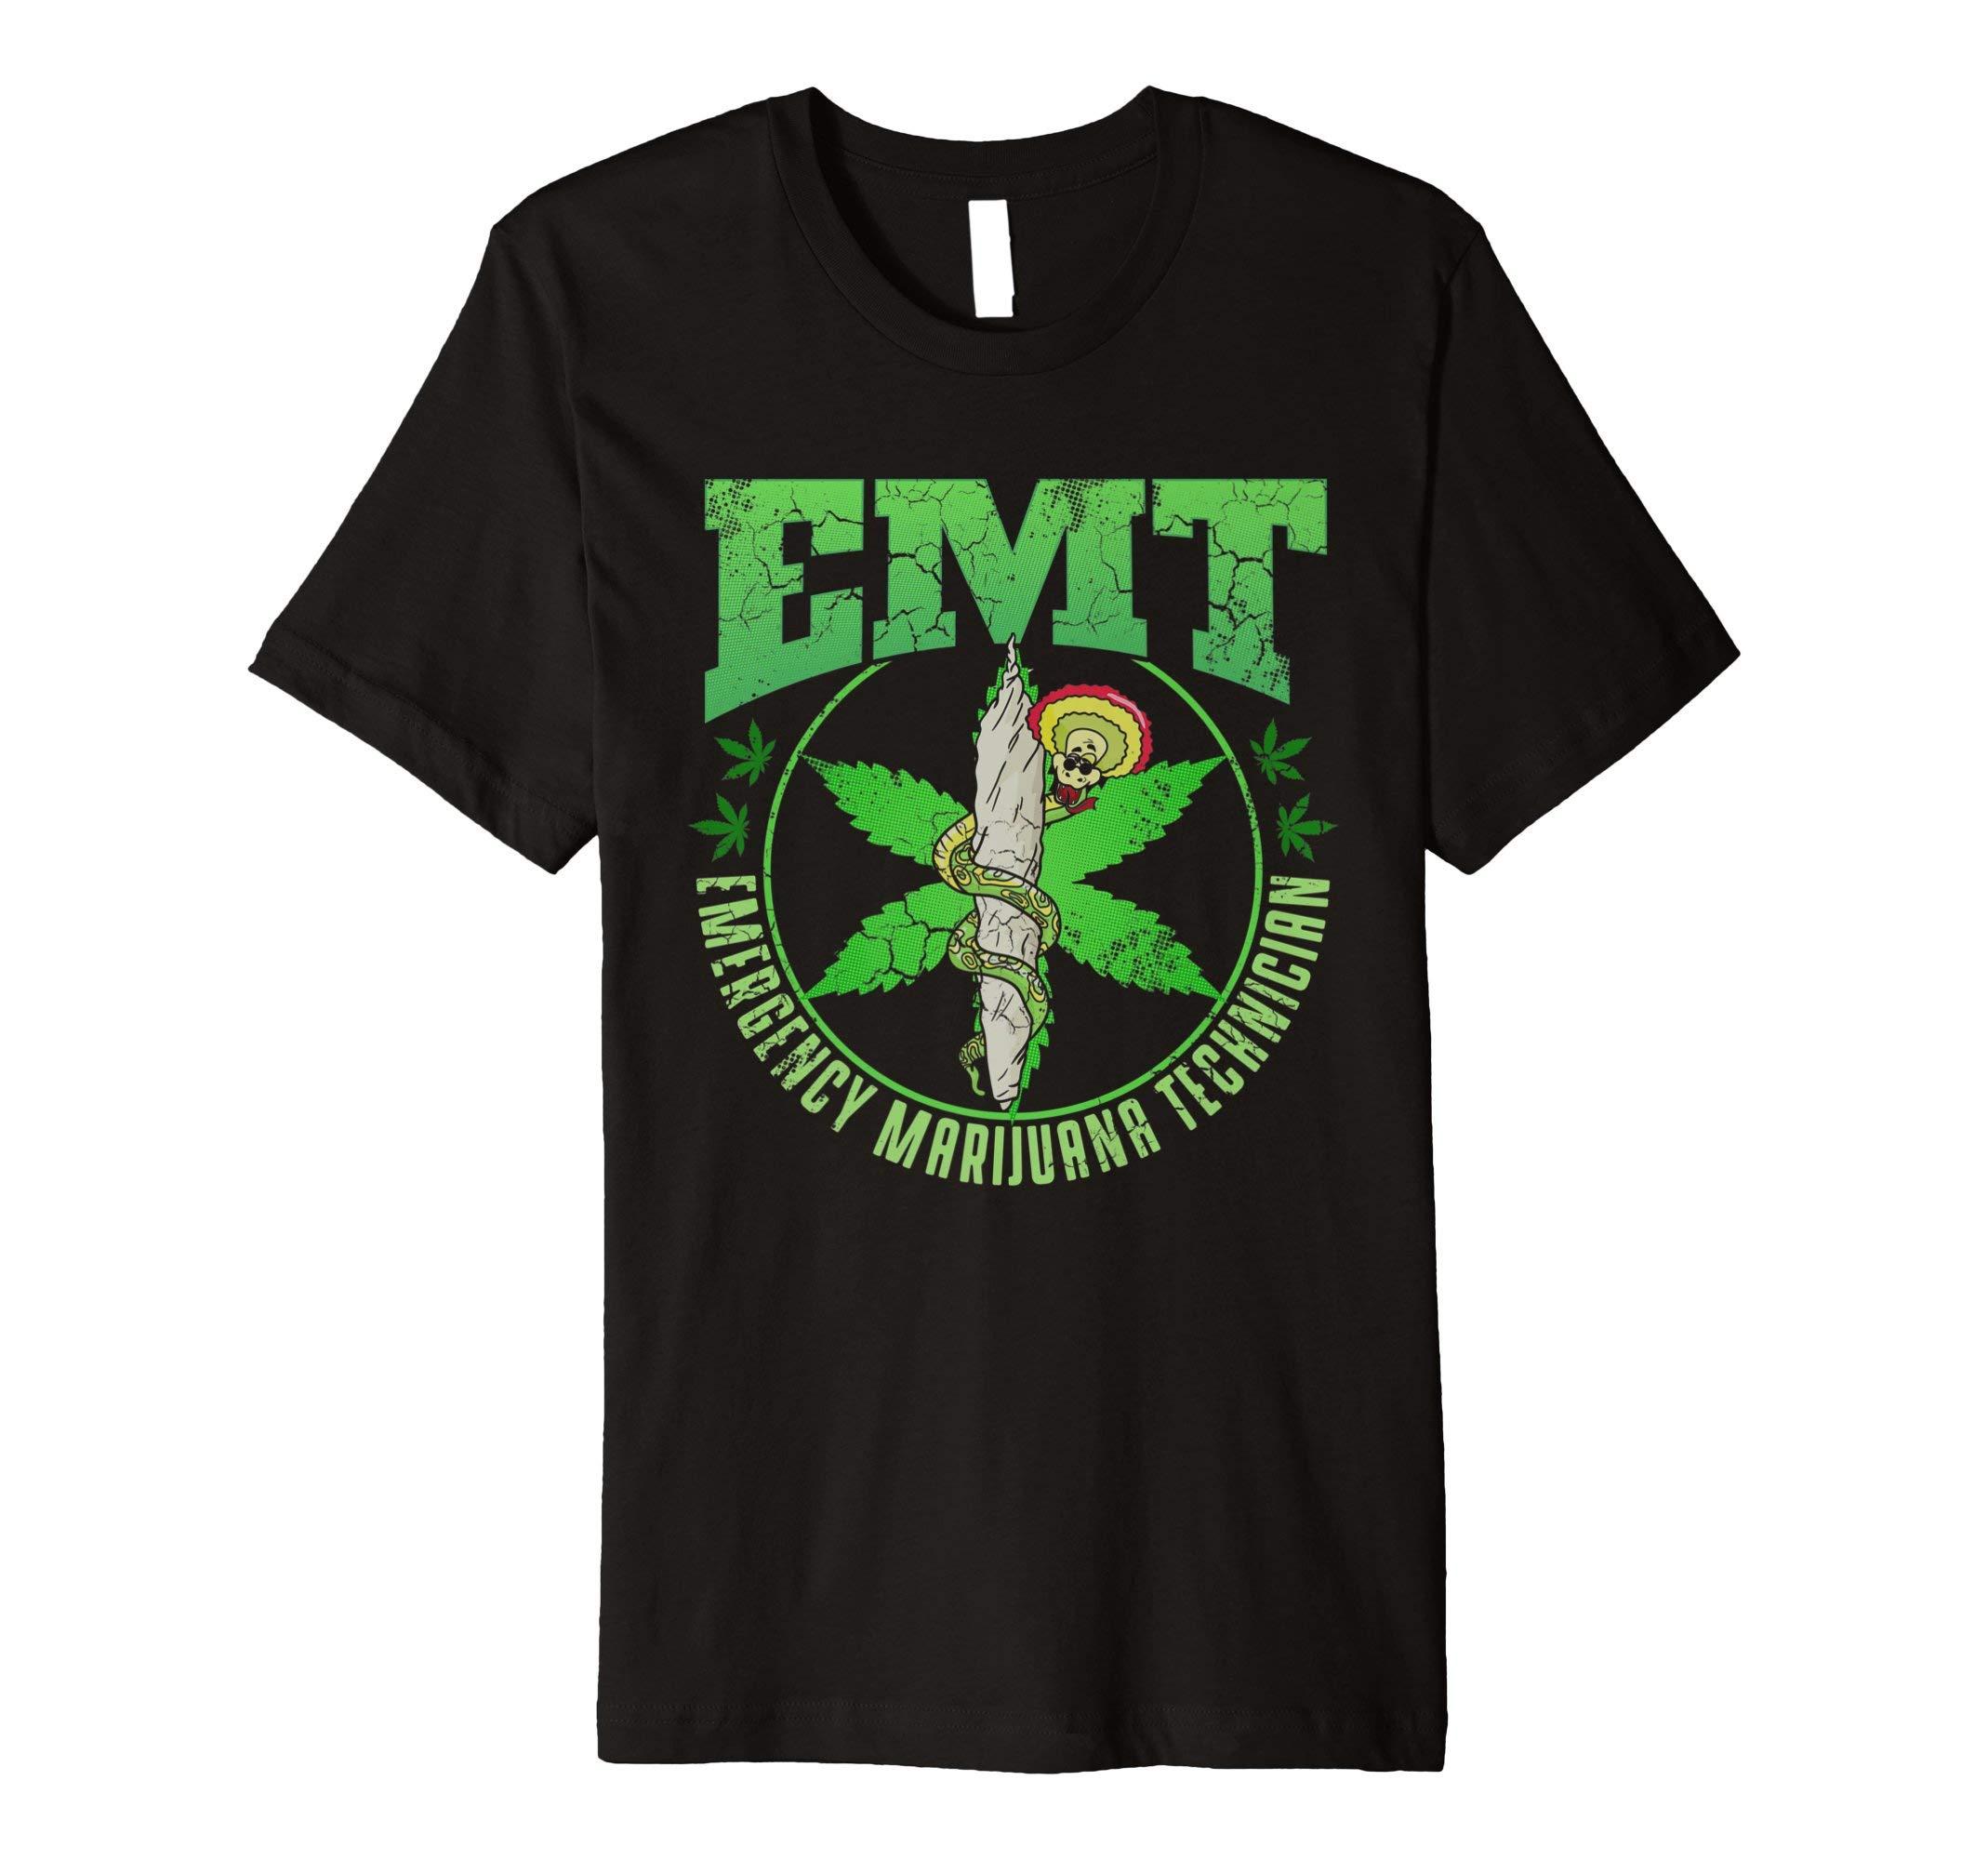 Cannabis Marijuana 420 T-Shirt Funny Quotes Sayings Adult